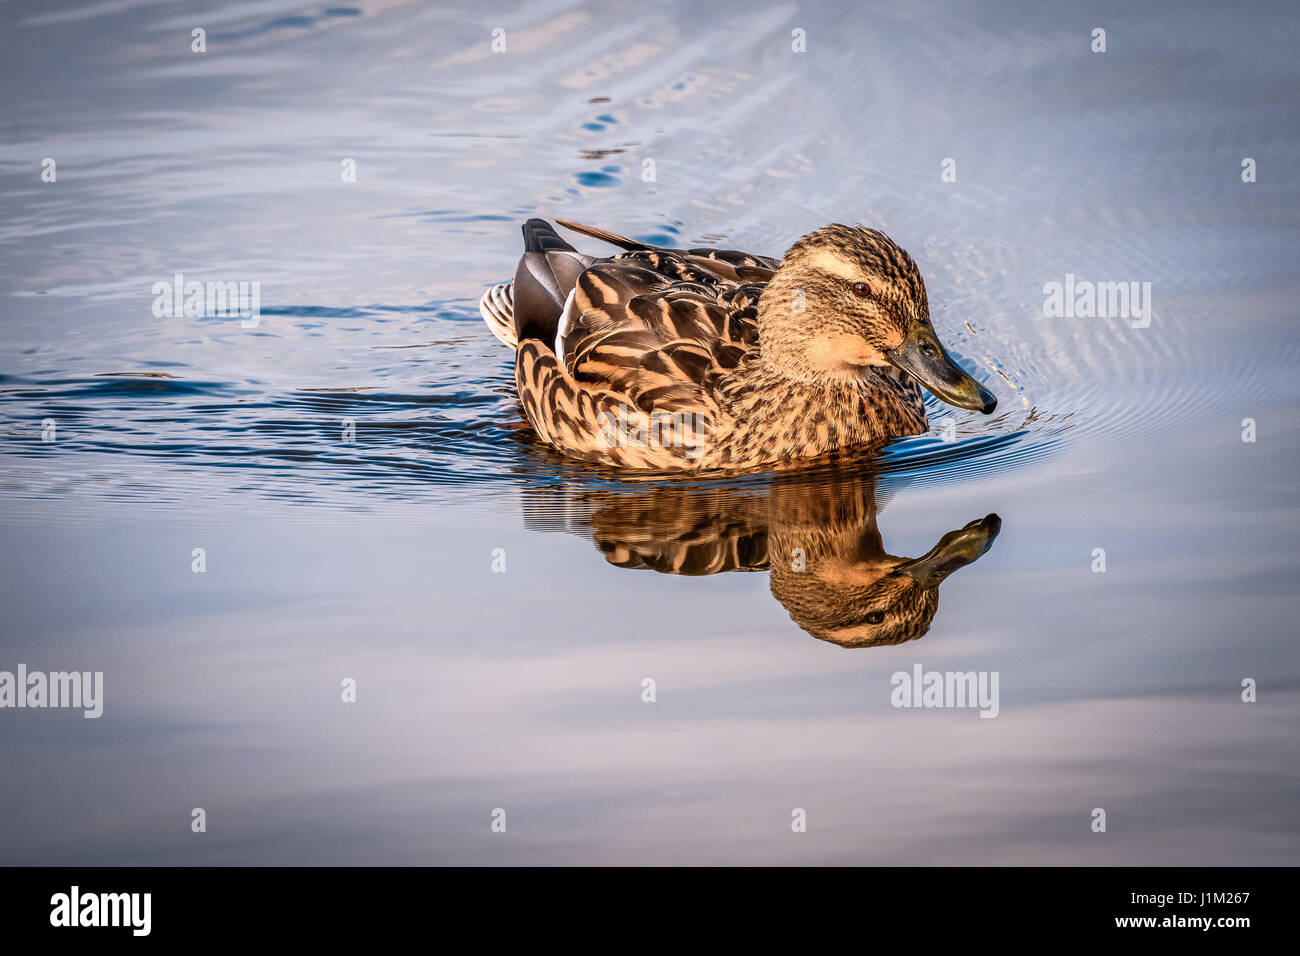 Urban birding stock photos urban birding stock images for Duck pond water